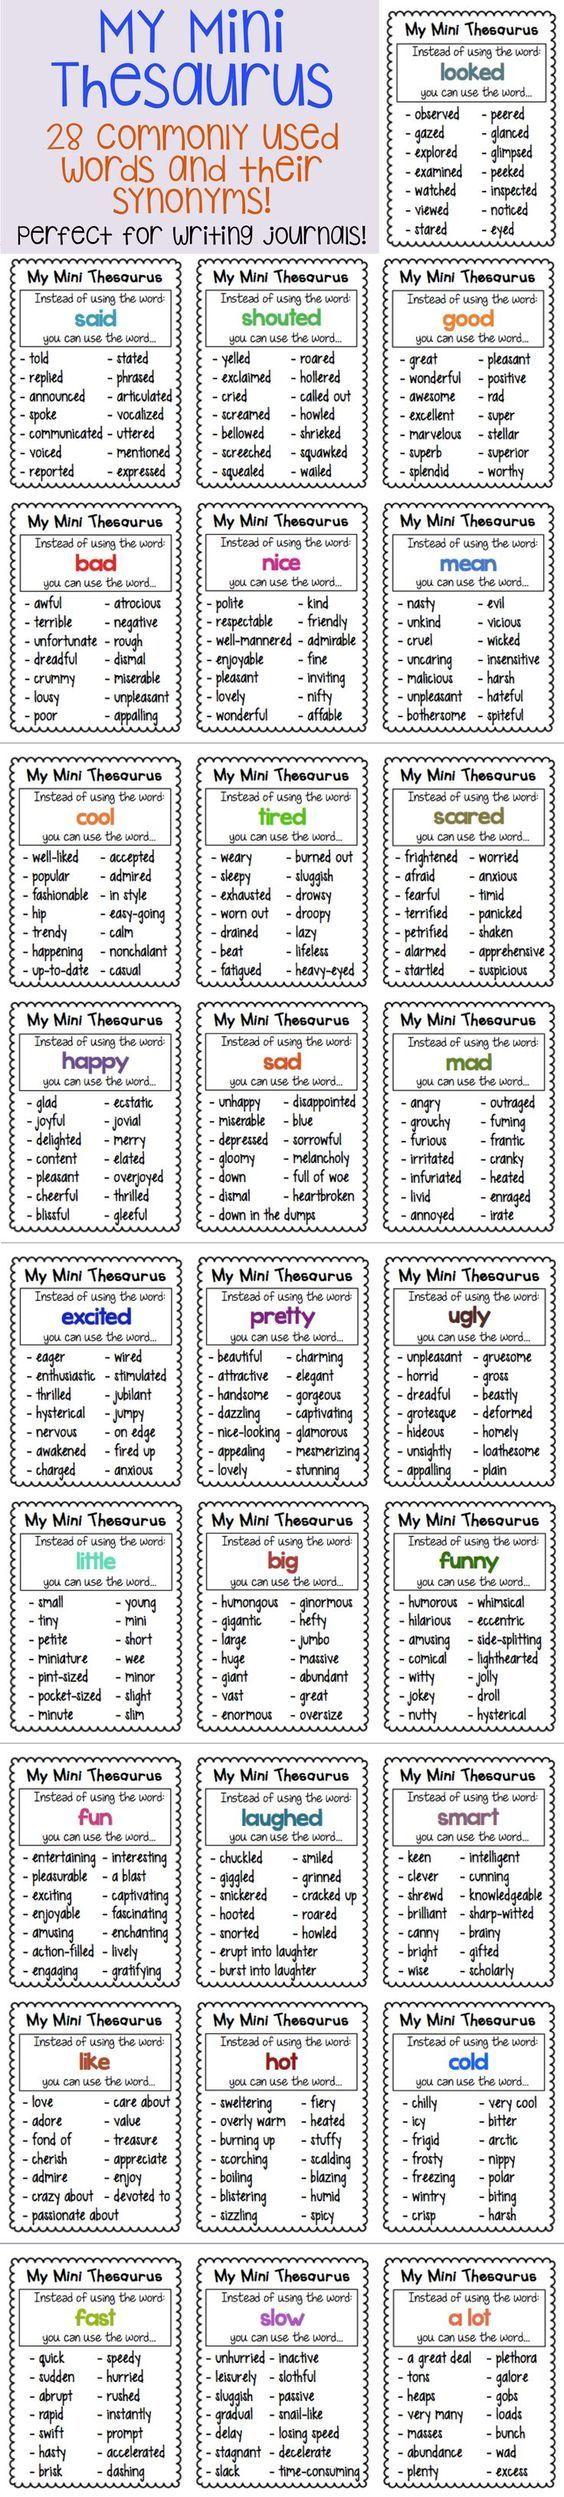 21 Best Esol Images On Pinterest English Grammar English Language